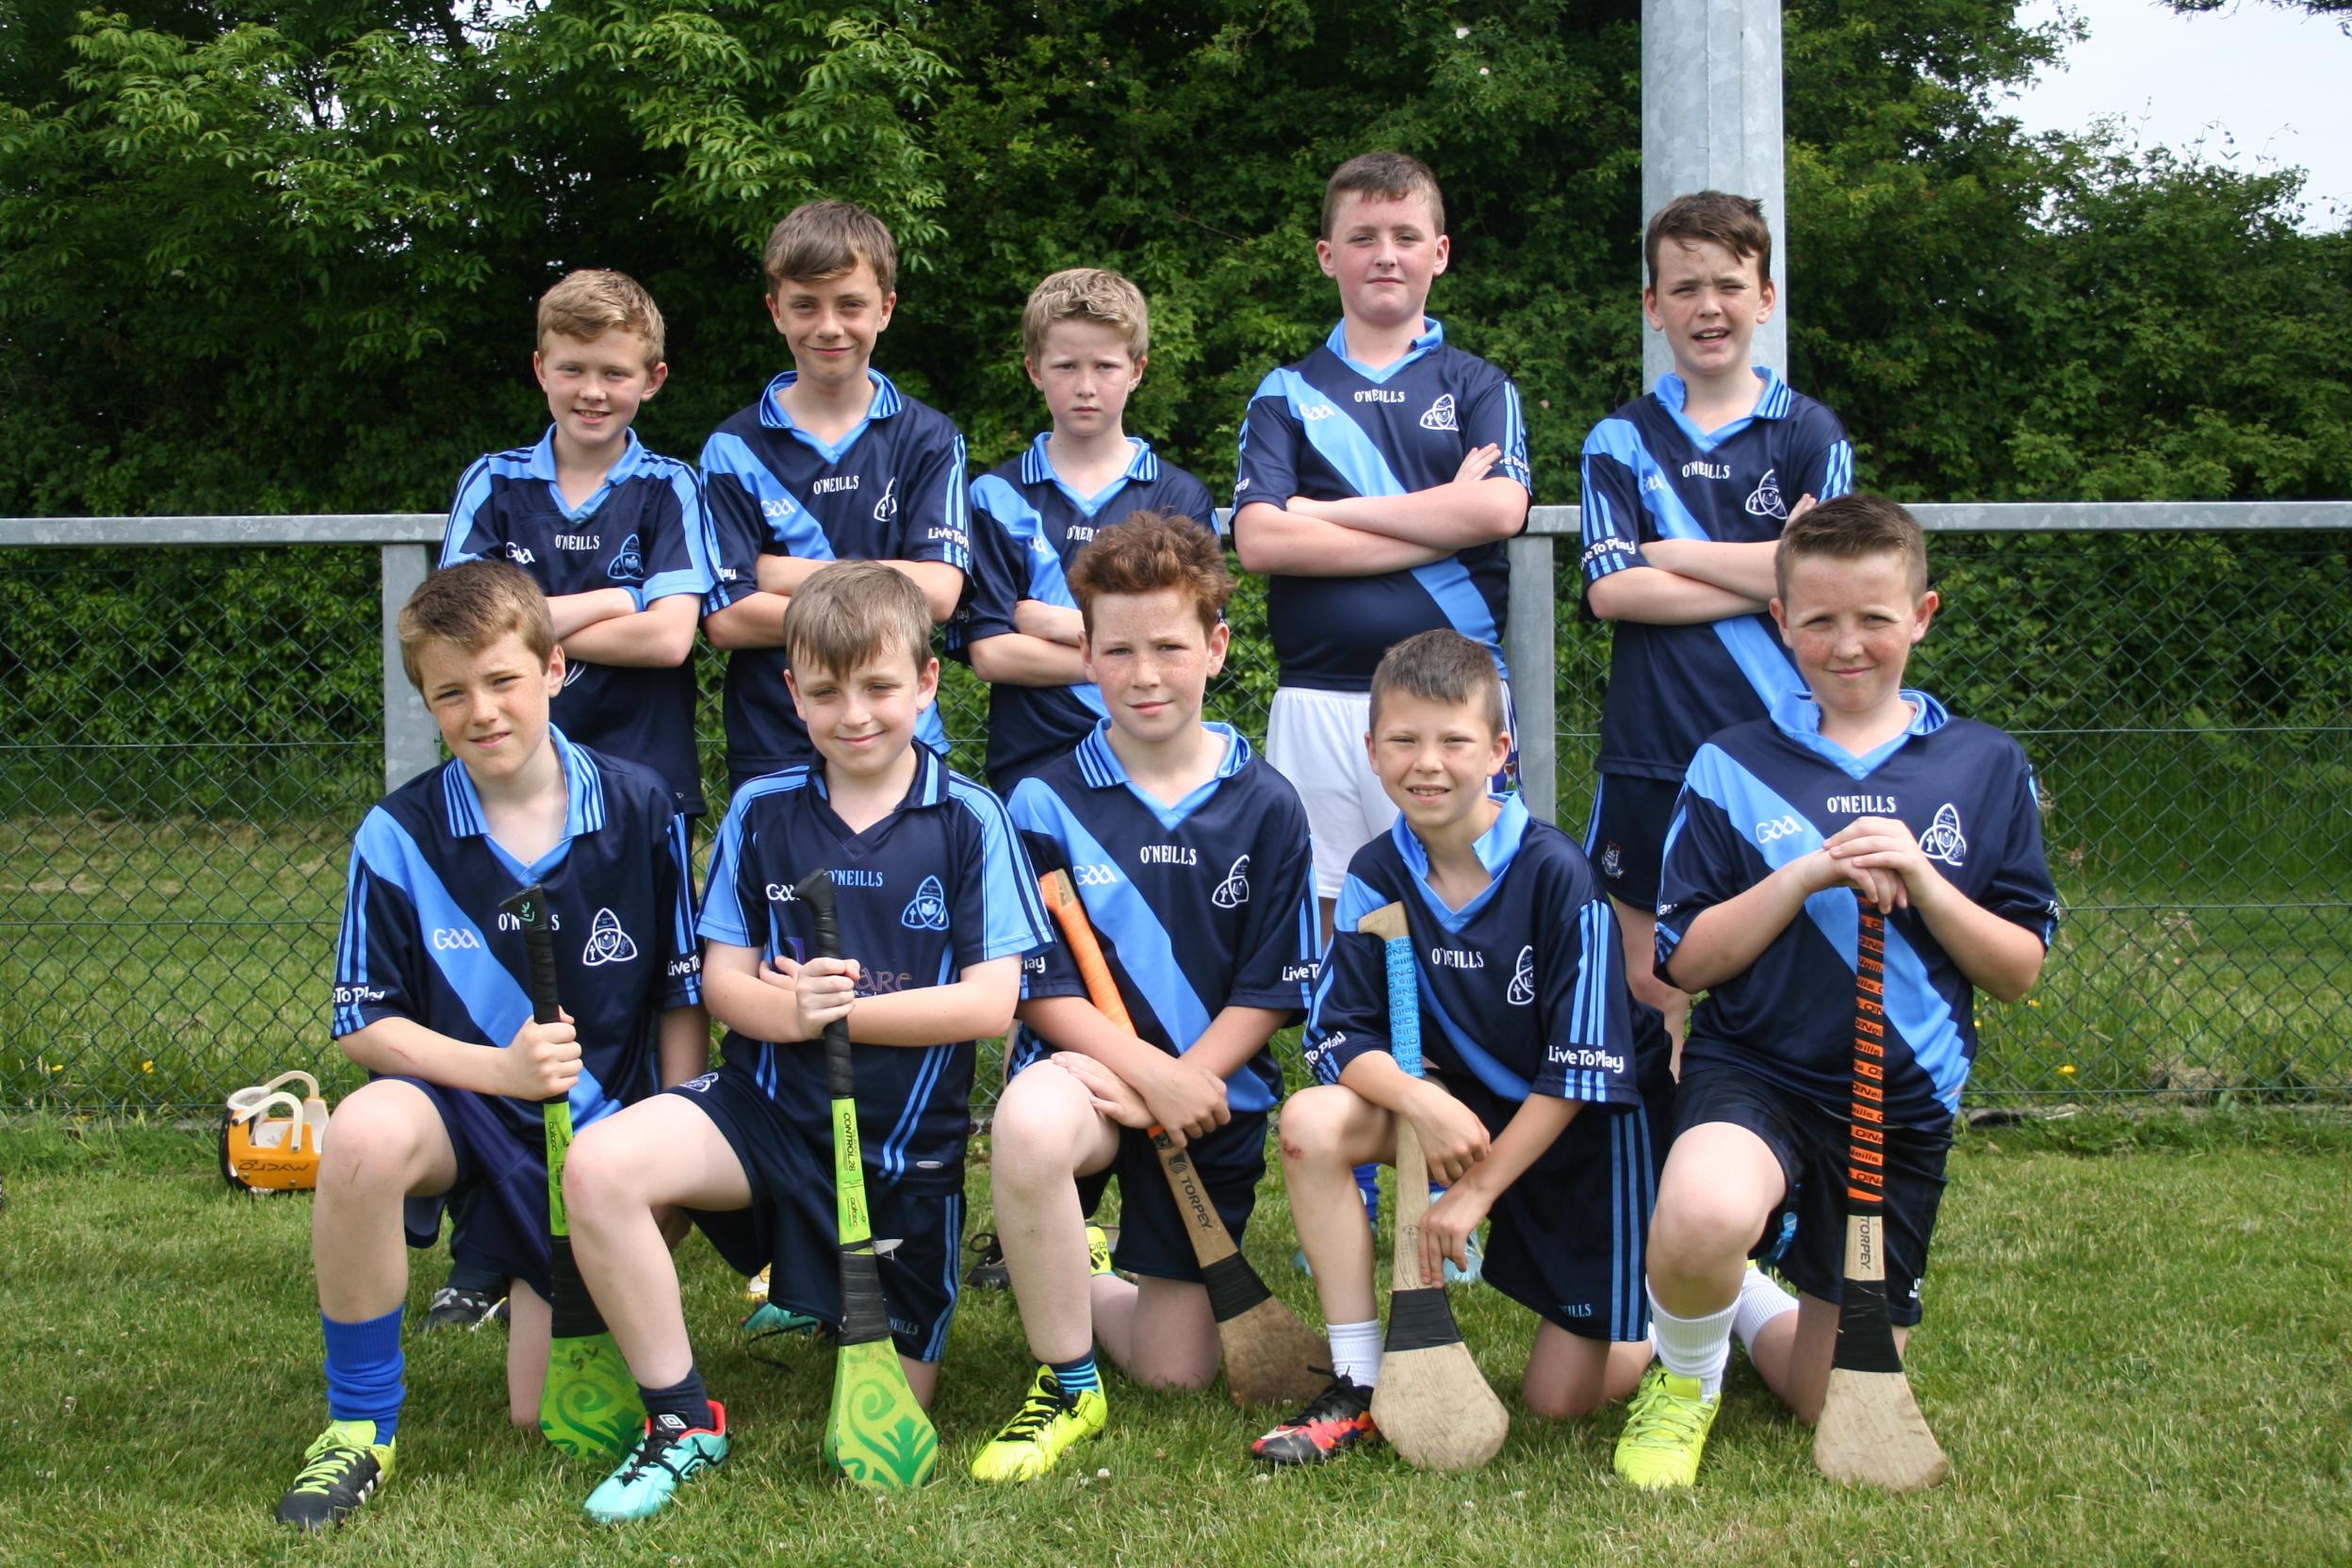 Hurling Blitz a great success for Cumann Pheadaír Naofa